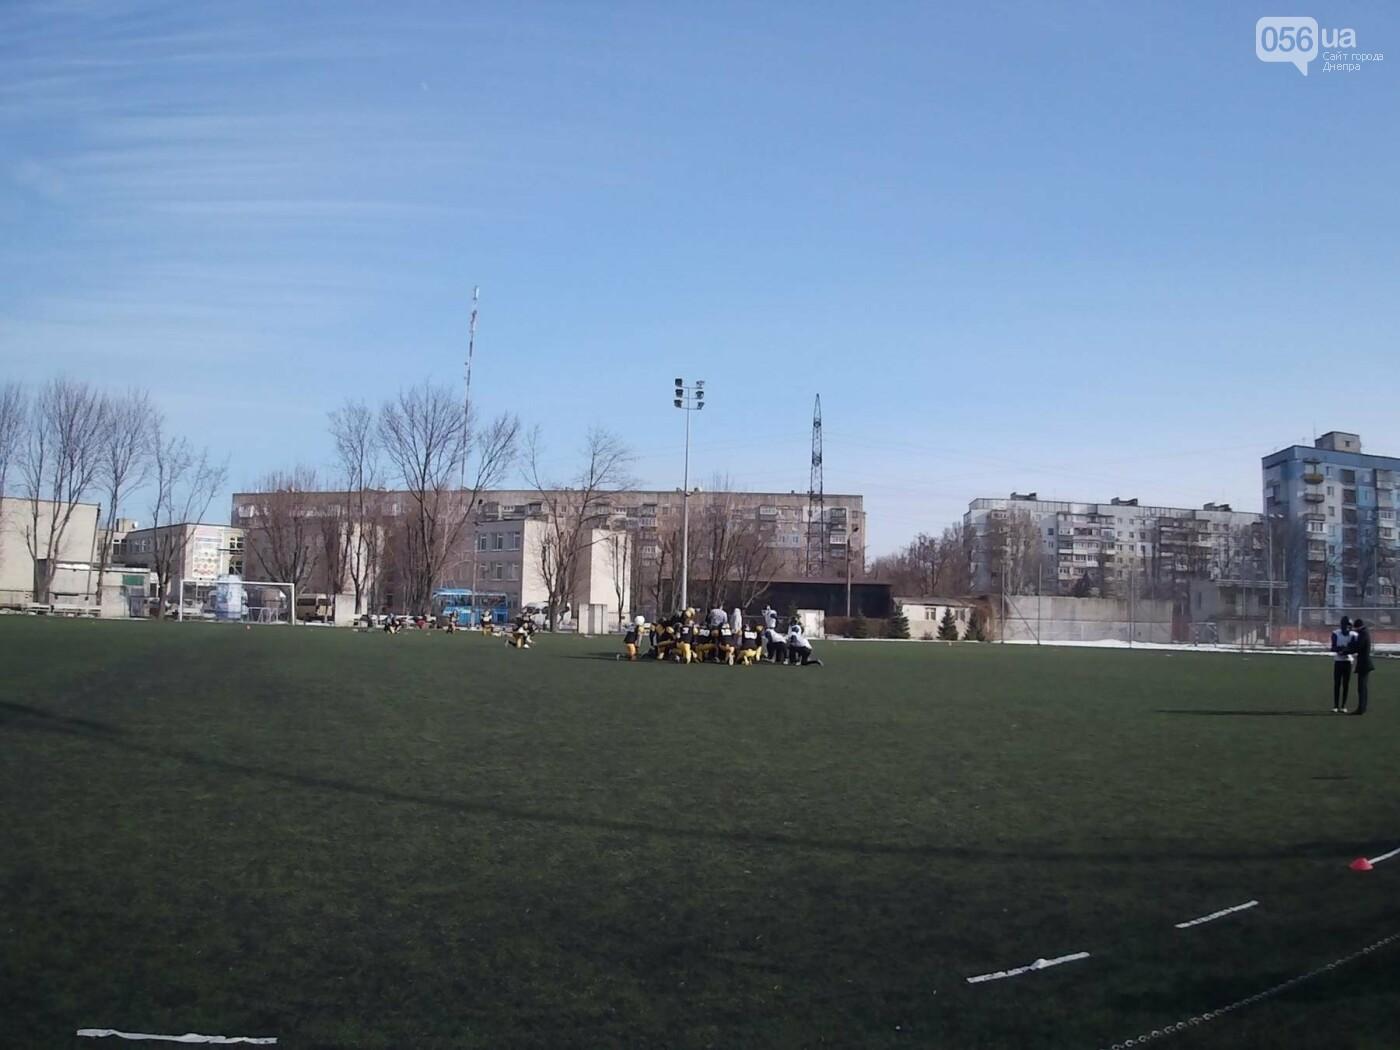 В Днепре открылся сезон американского футбола (ФОТО, ВИДЕО), фото-4